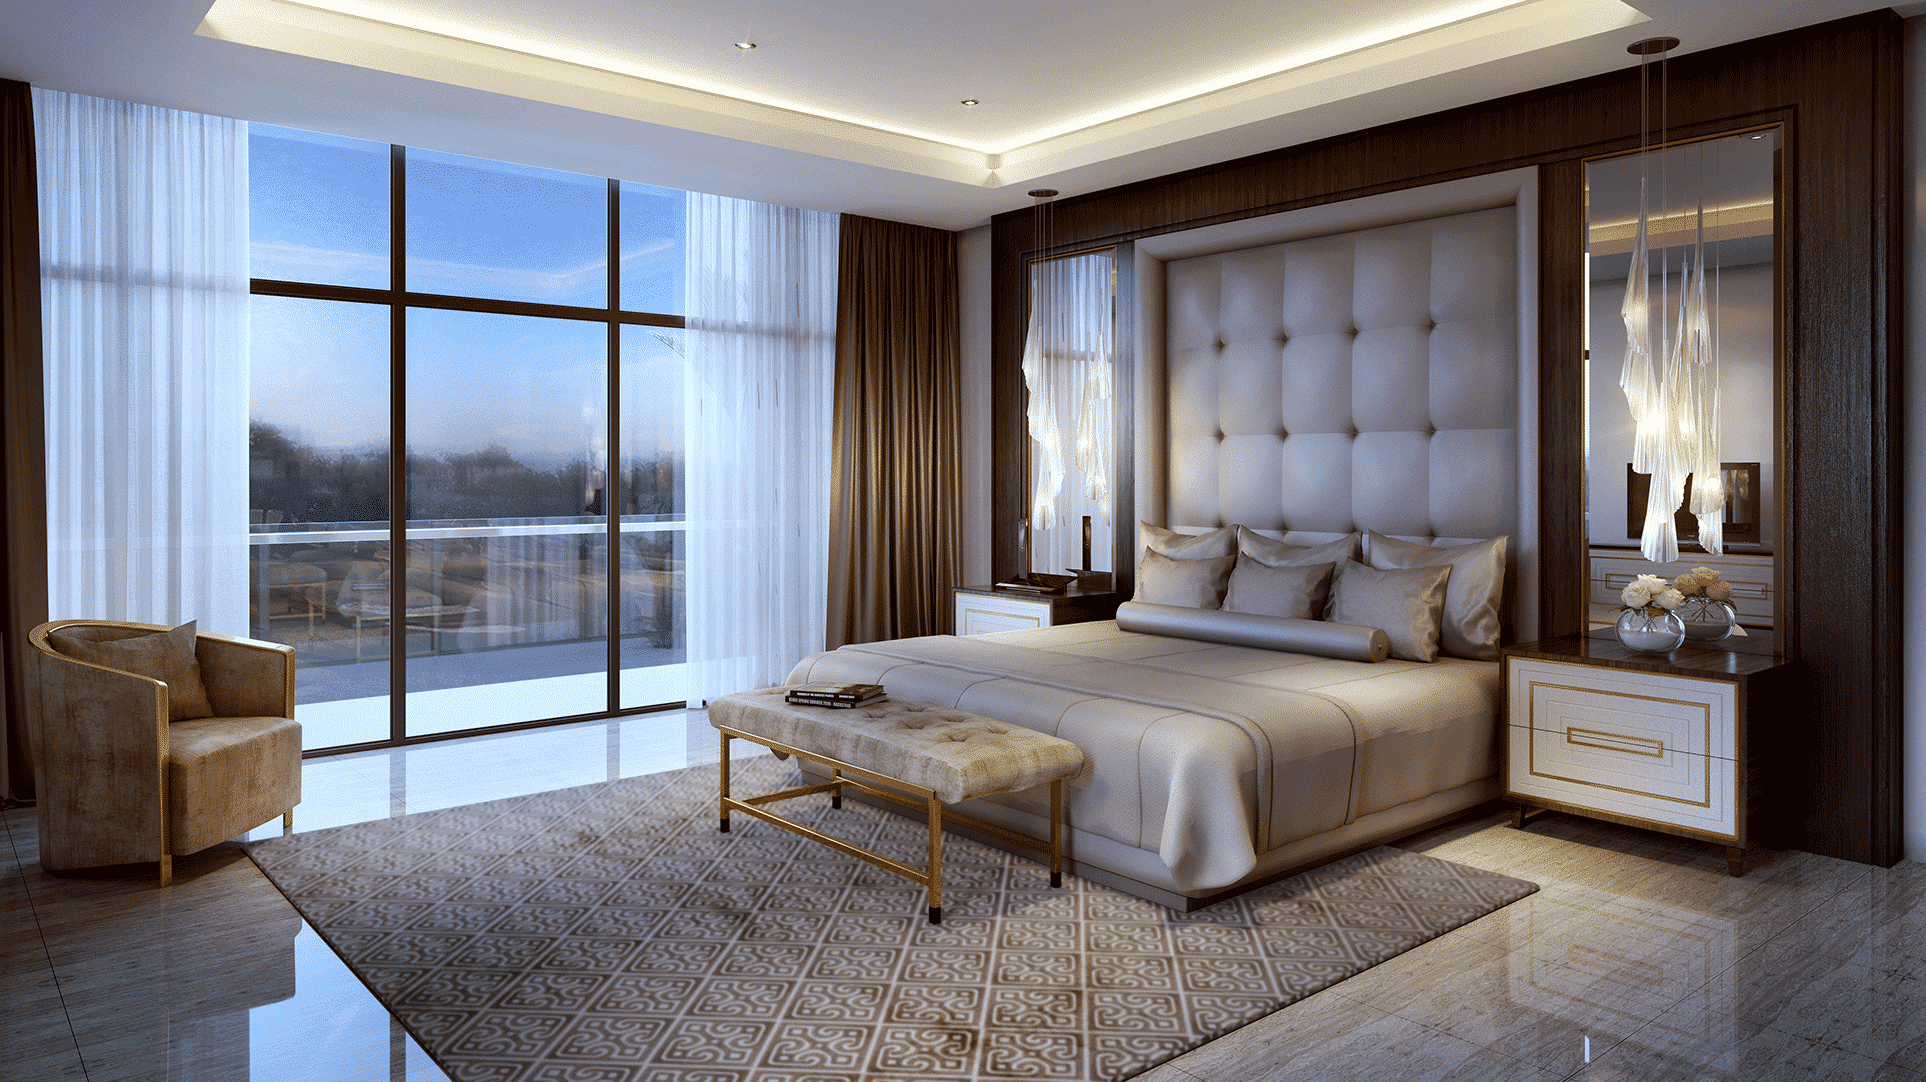 The Trump Estates by Damac at Damac Hills. Luxury apartments for Sale in Dubai 3